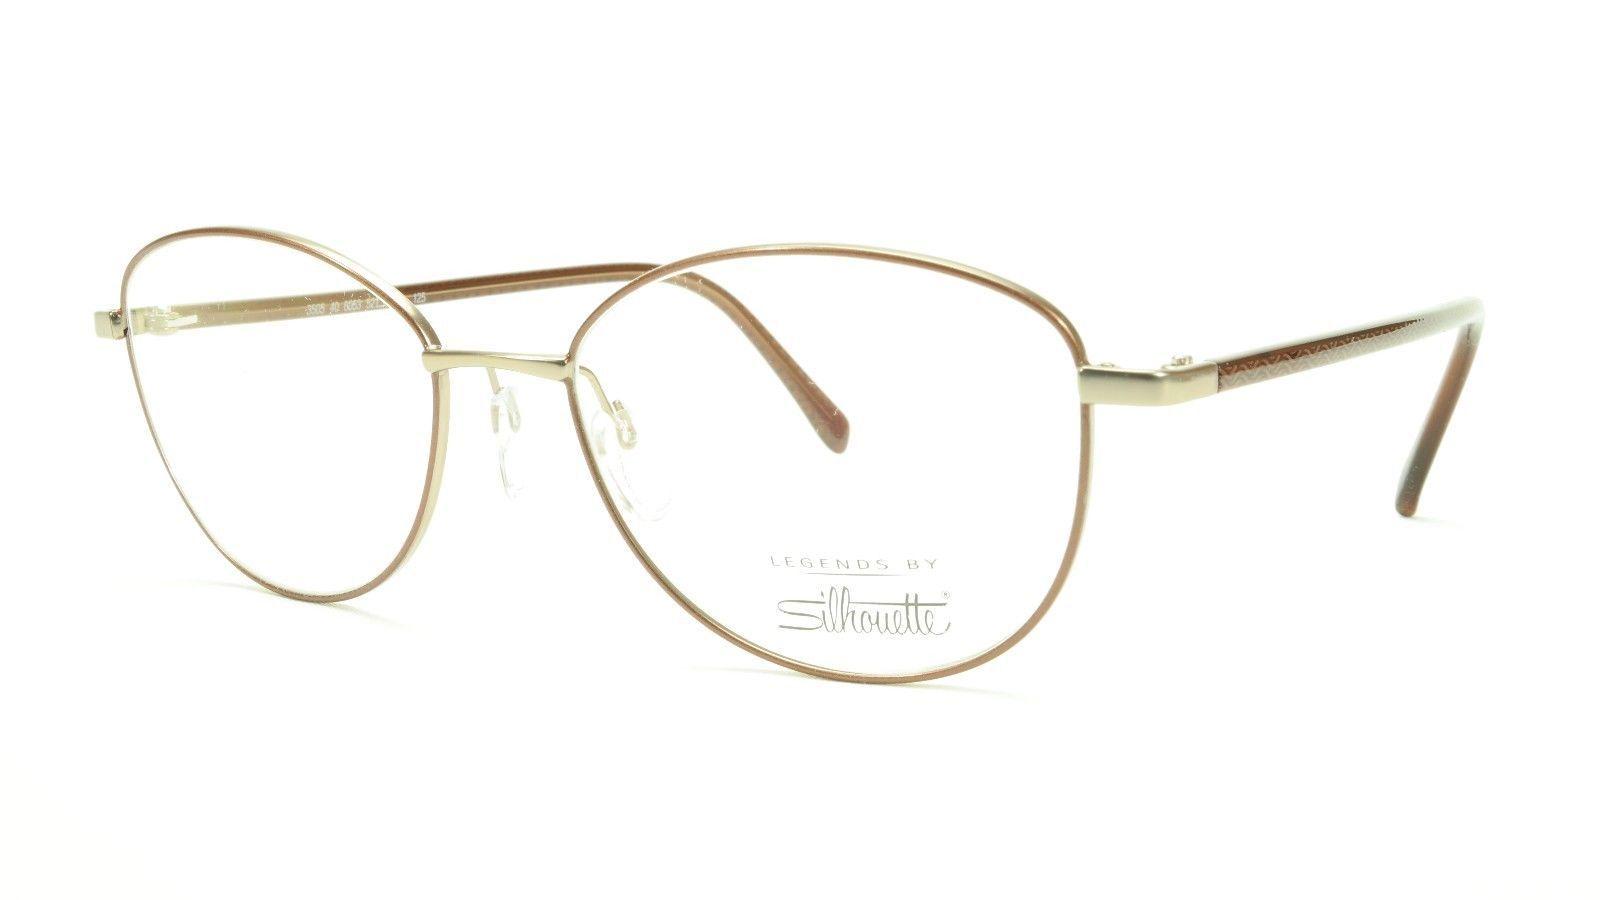 a6773d4303e6 Silhouette Eyeglasses 3505 40 6053 Titanium and 50 similar items. S l1600